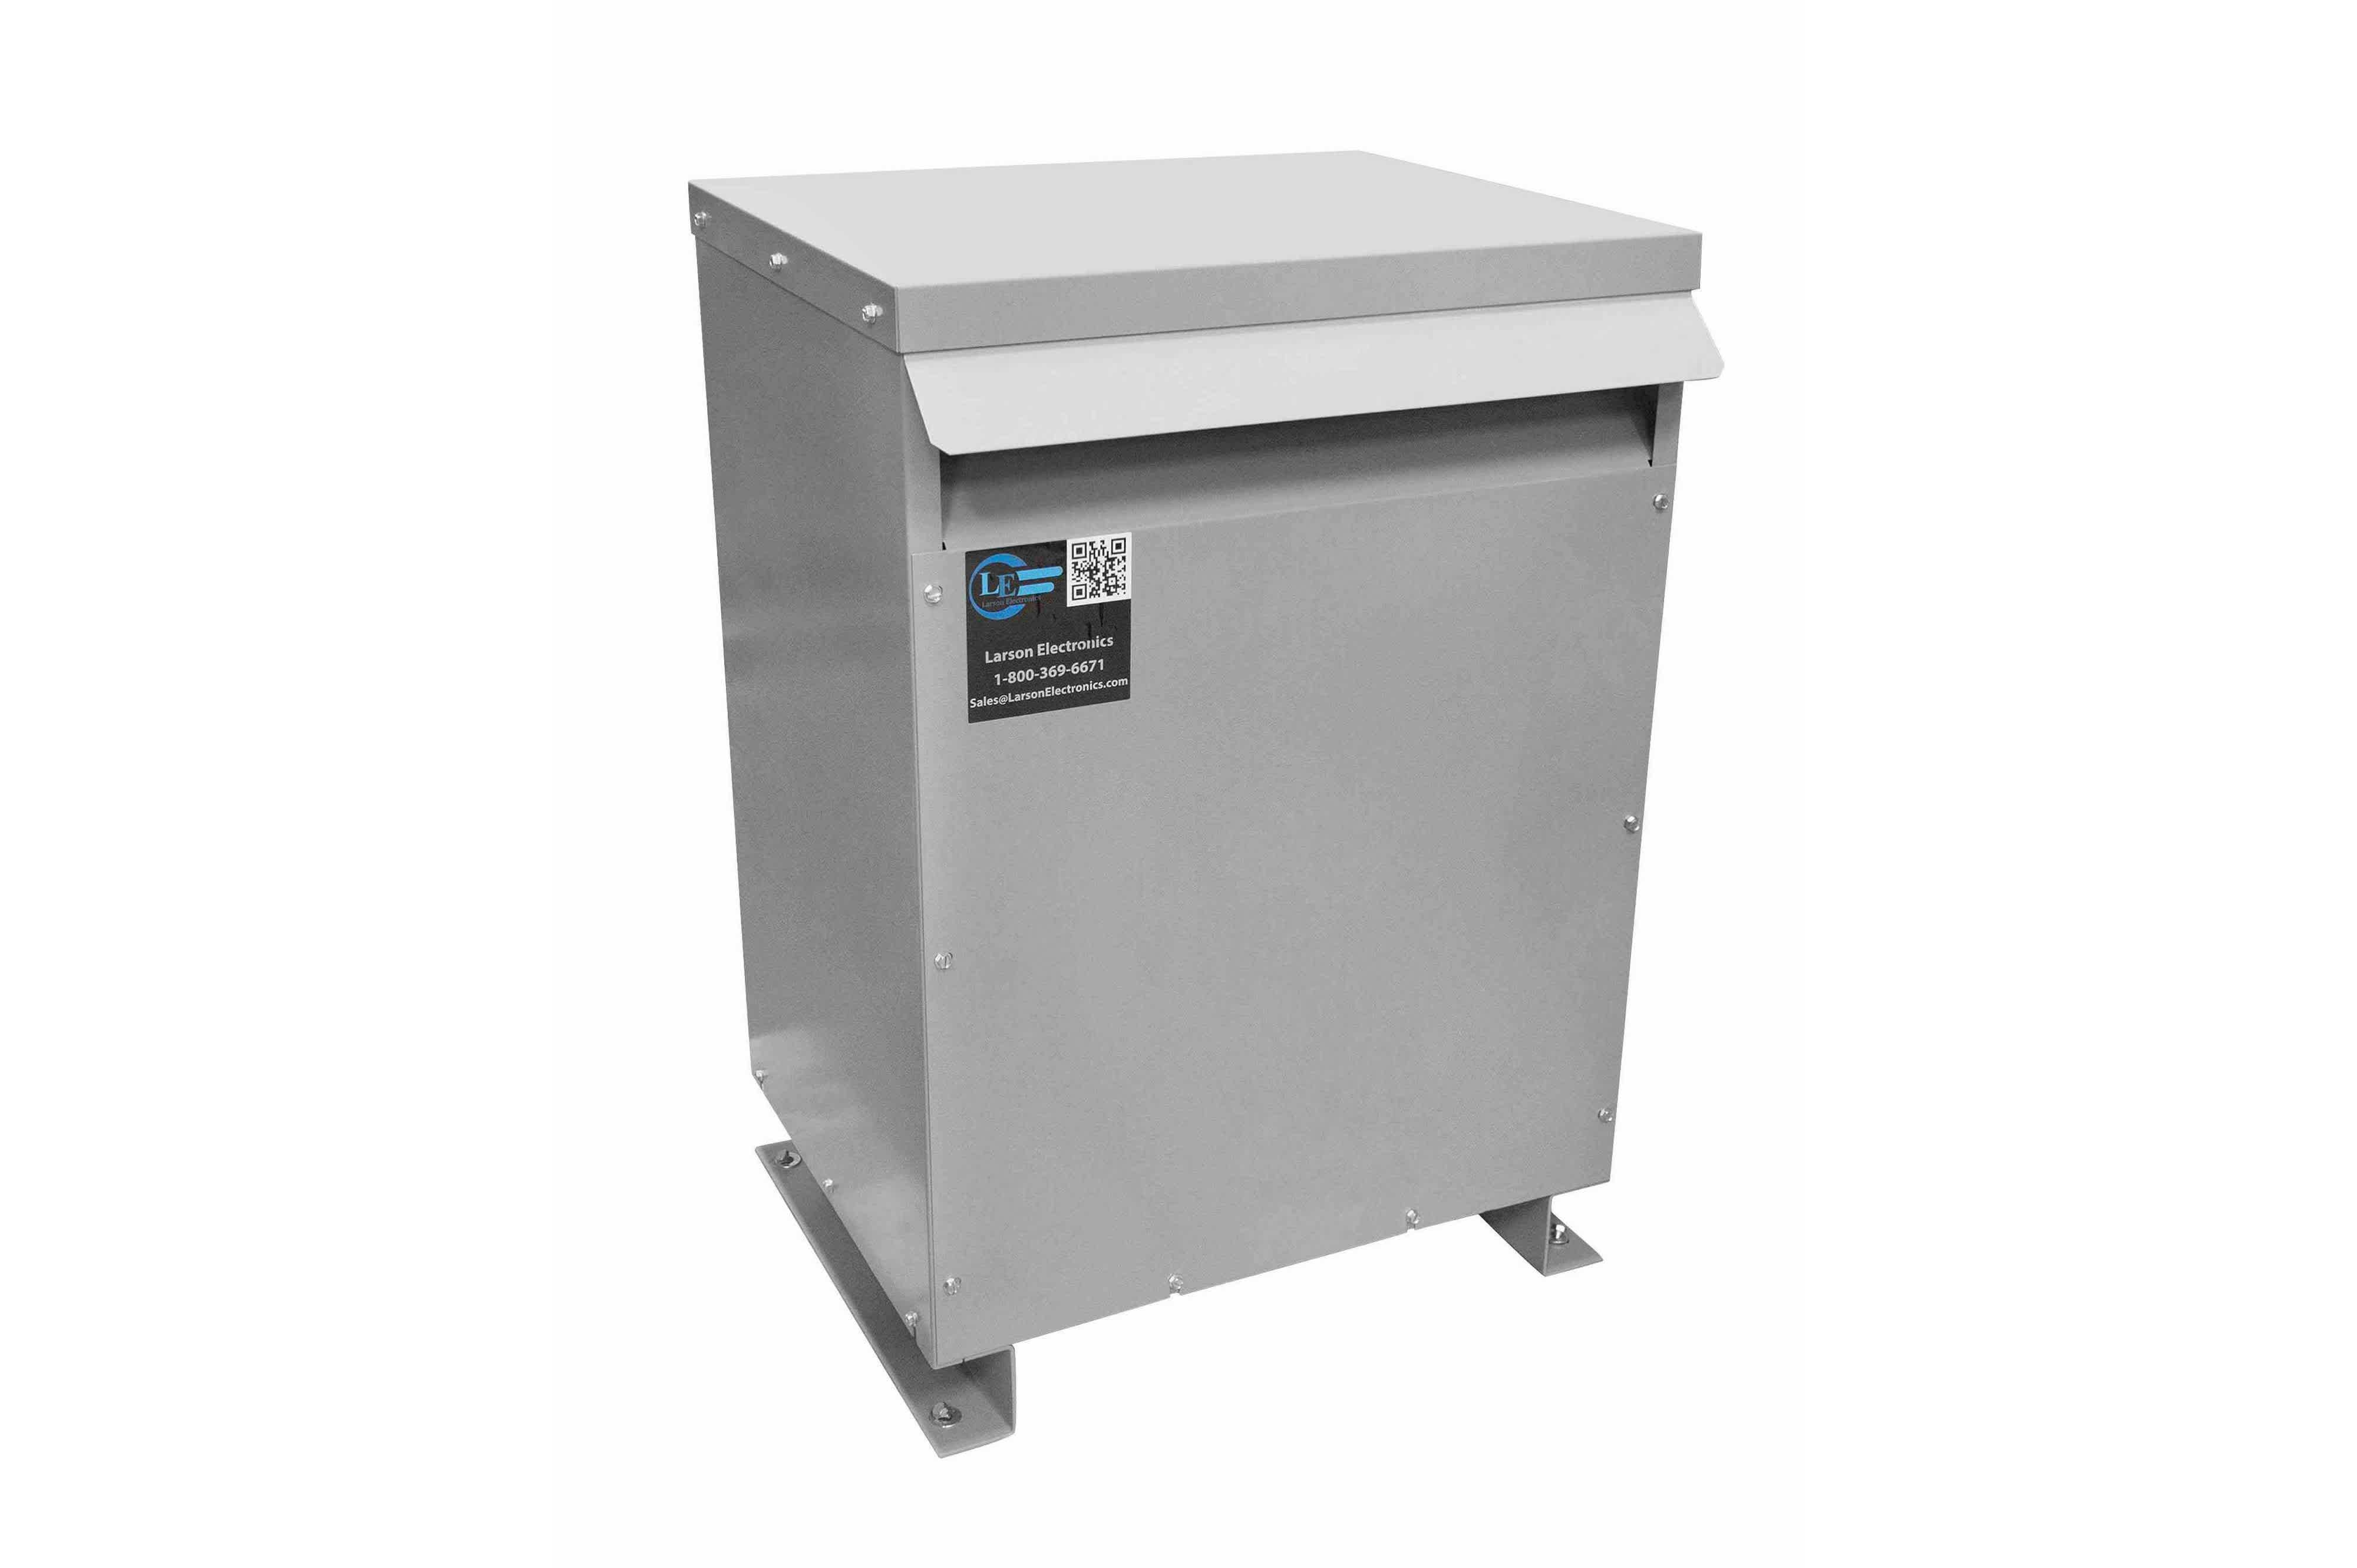 600 kVA 3PH Isolation Transformer, 460V Wye Primary, 240V/120 Delta Secondary, N3R, Ventilated, 60 Hz